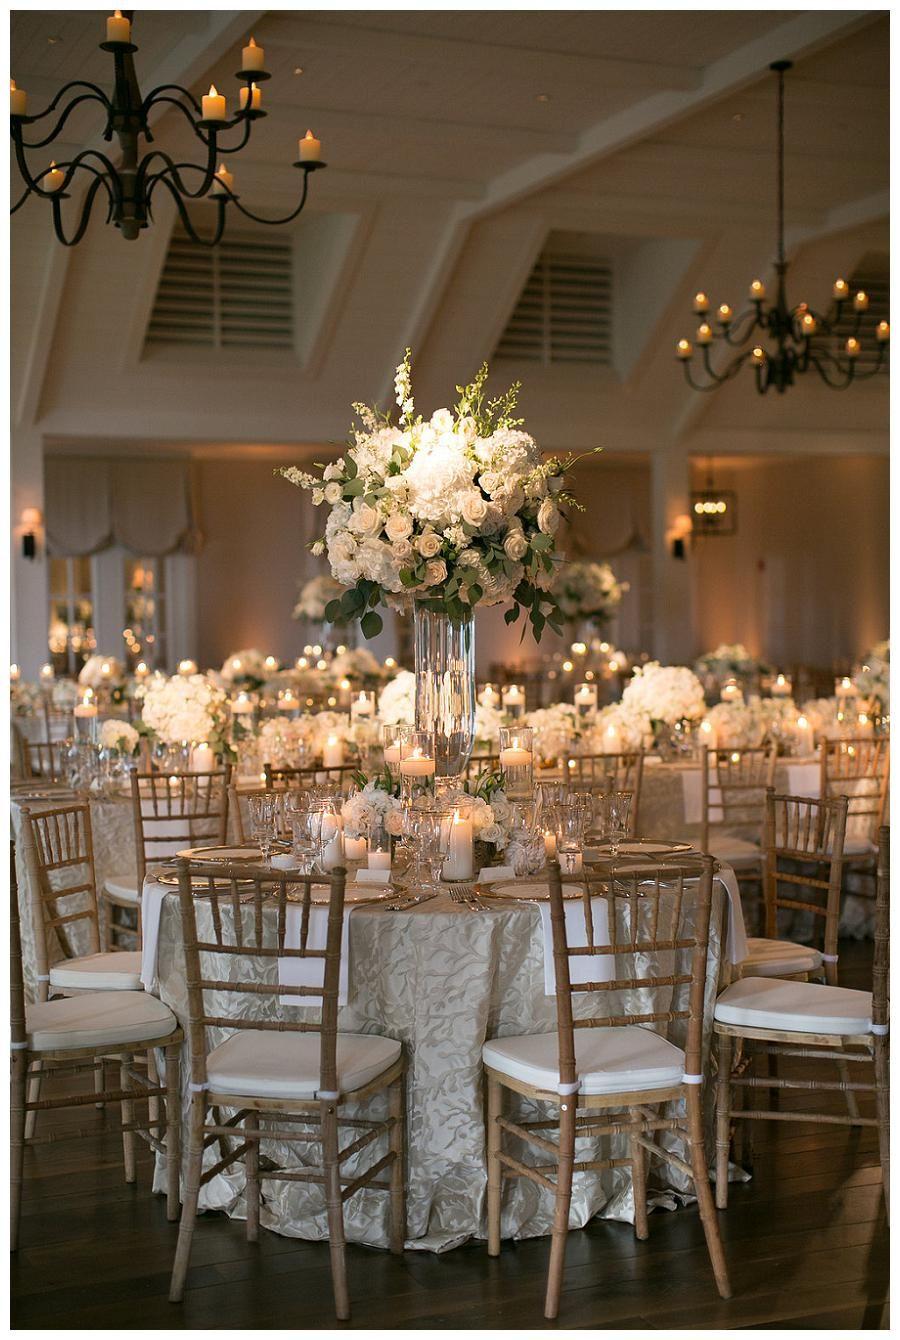 42 White Wedding Decoration Ideas | Wedding Decorations ...